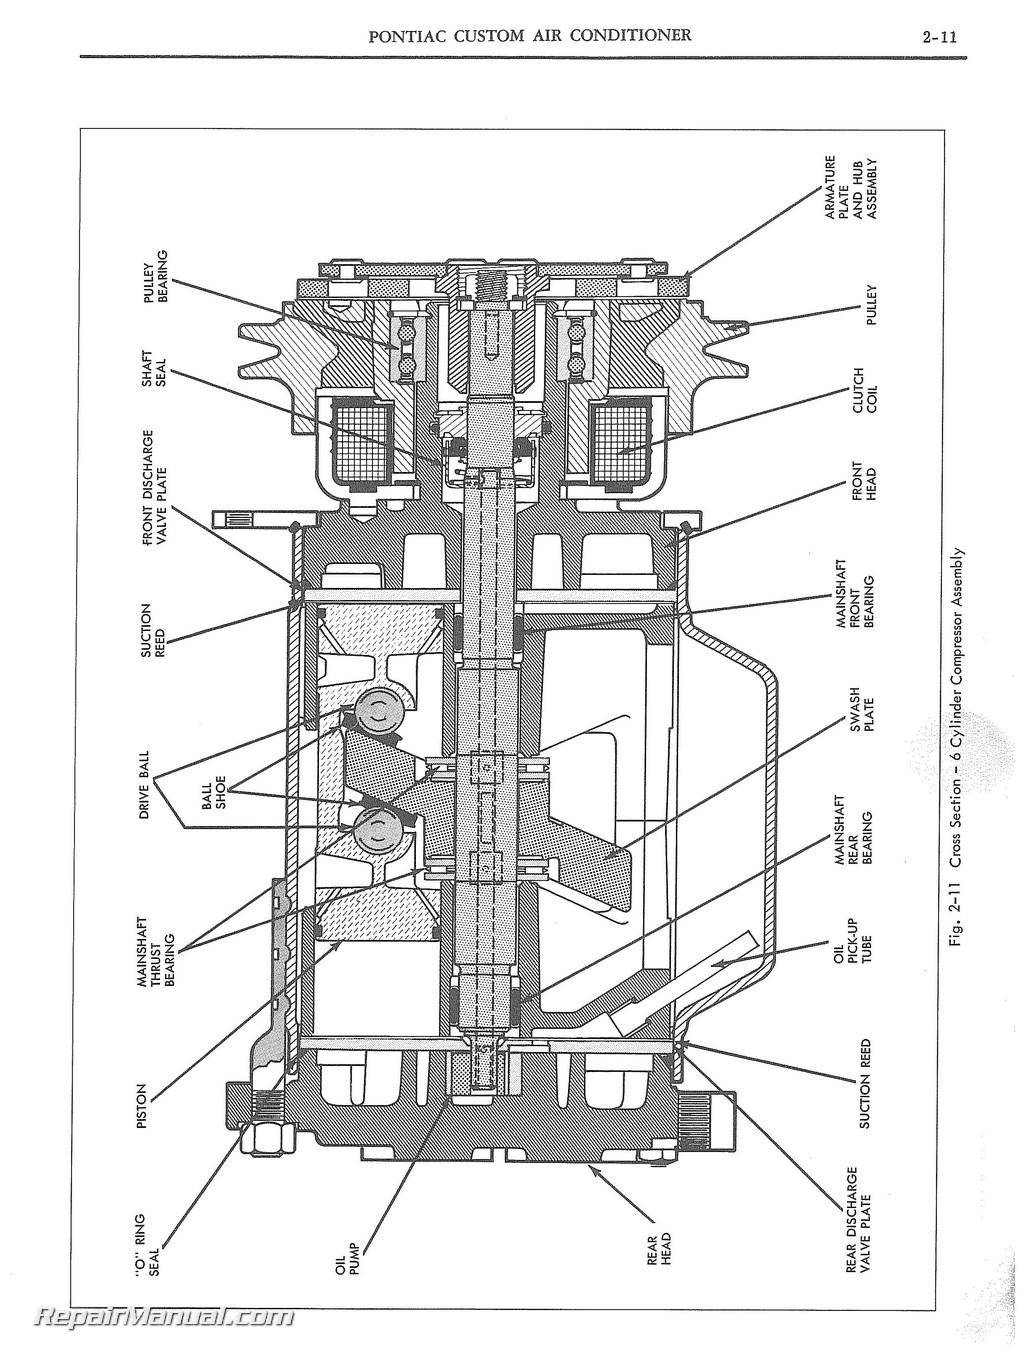 Download Car Manuals Pontiac Tempest Engine Control